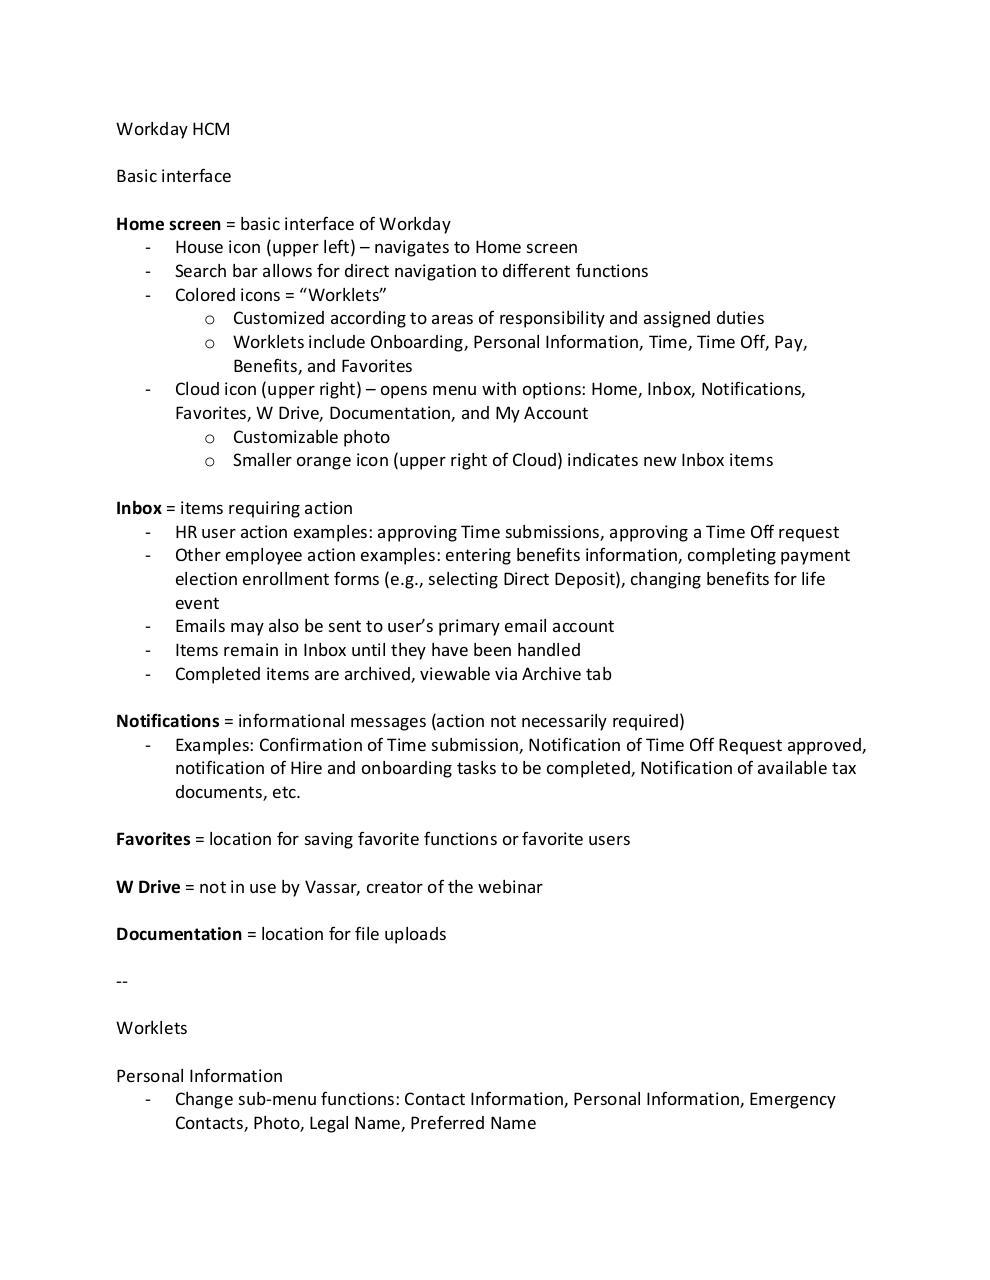 Workday HCM Training Notes docx - Workday HCM - Training Notes pdf